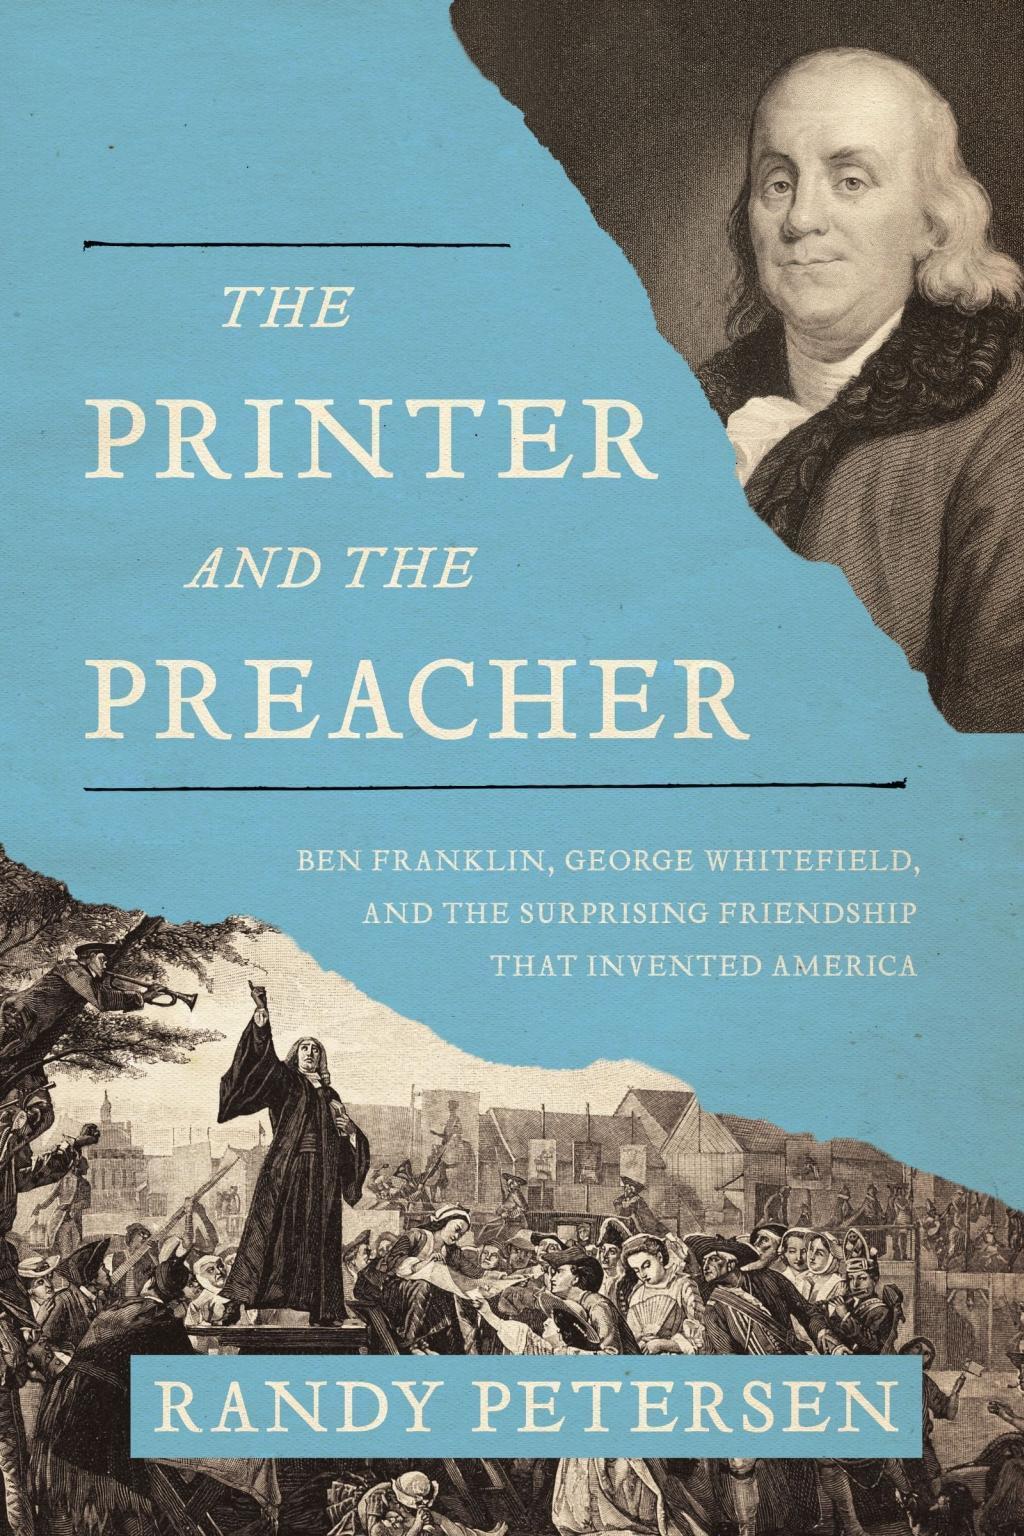 The Printer and the Preacher